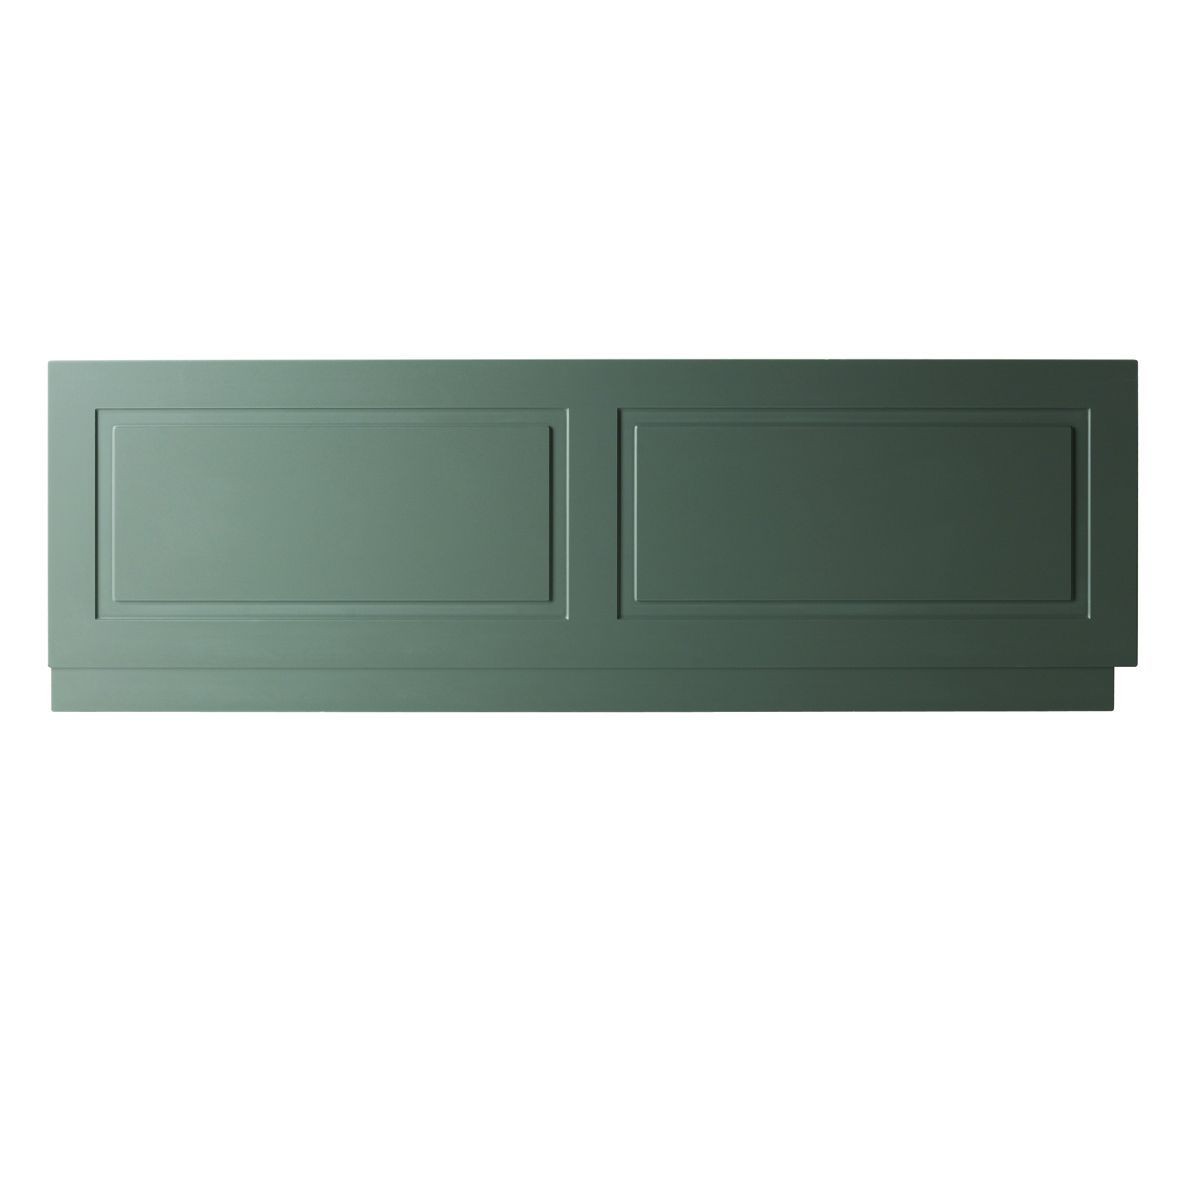 Kartell Astley Matt Grey Front Bath Panel 1800mm